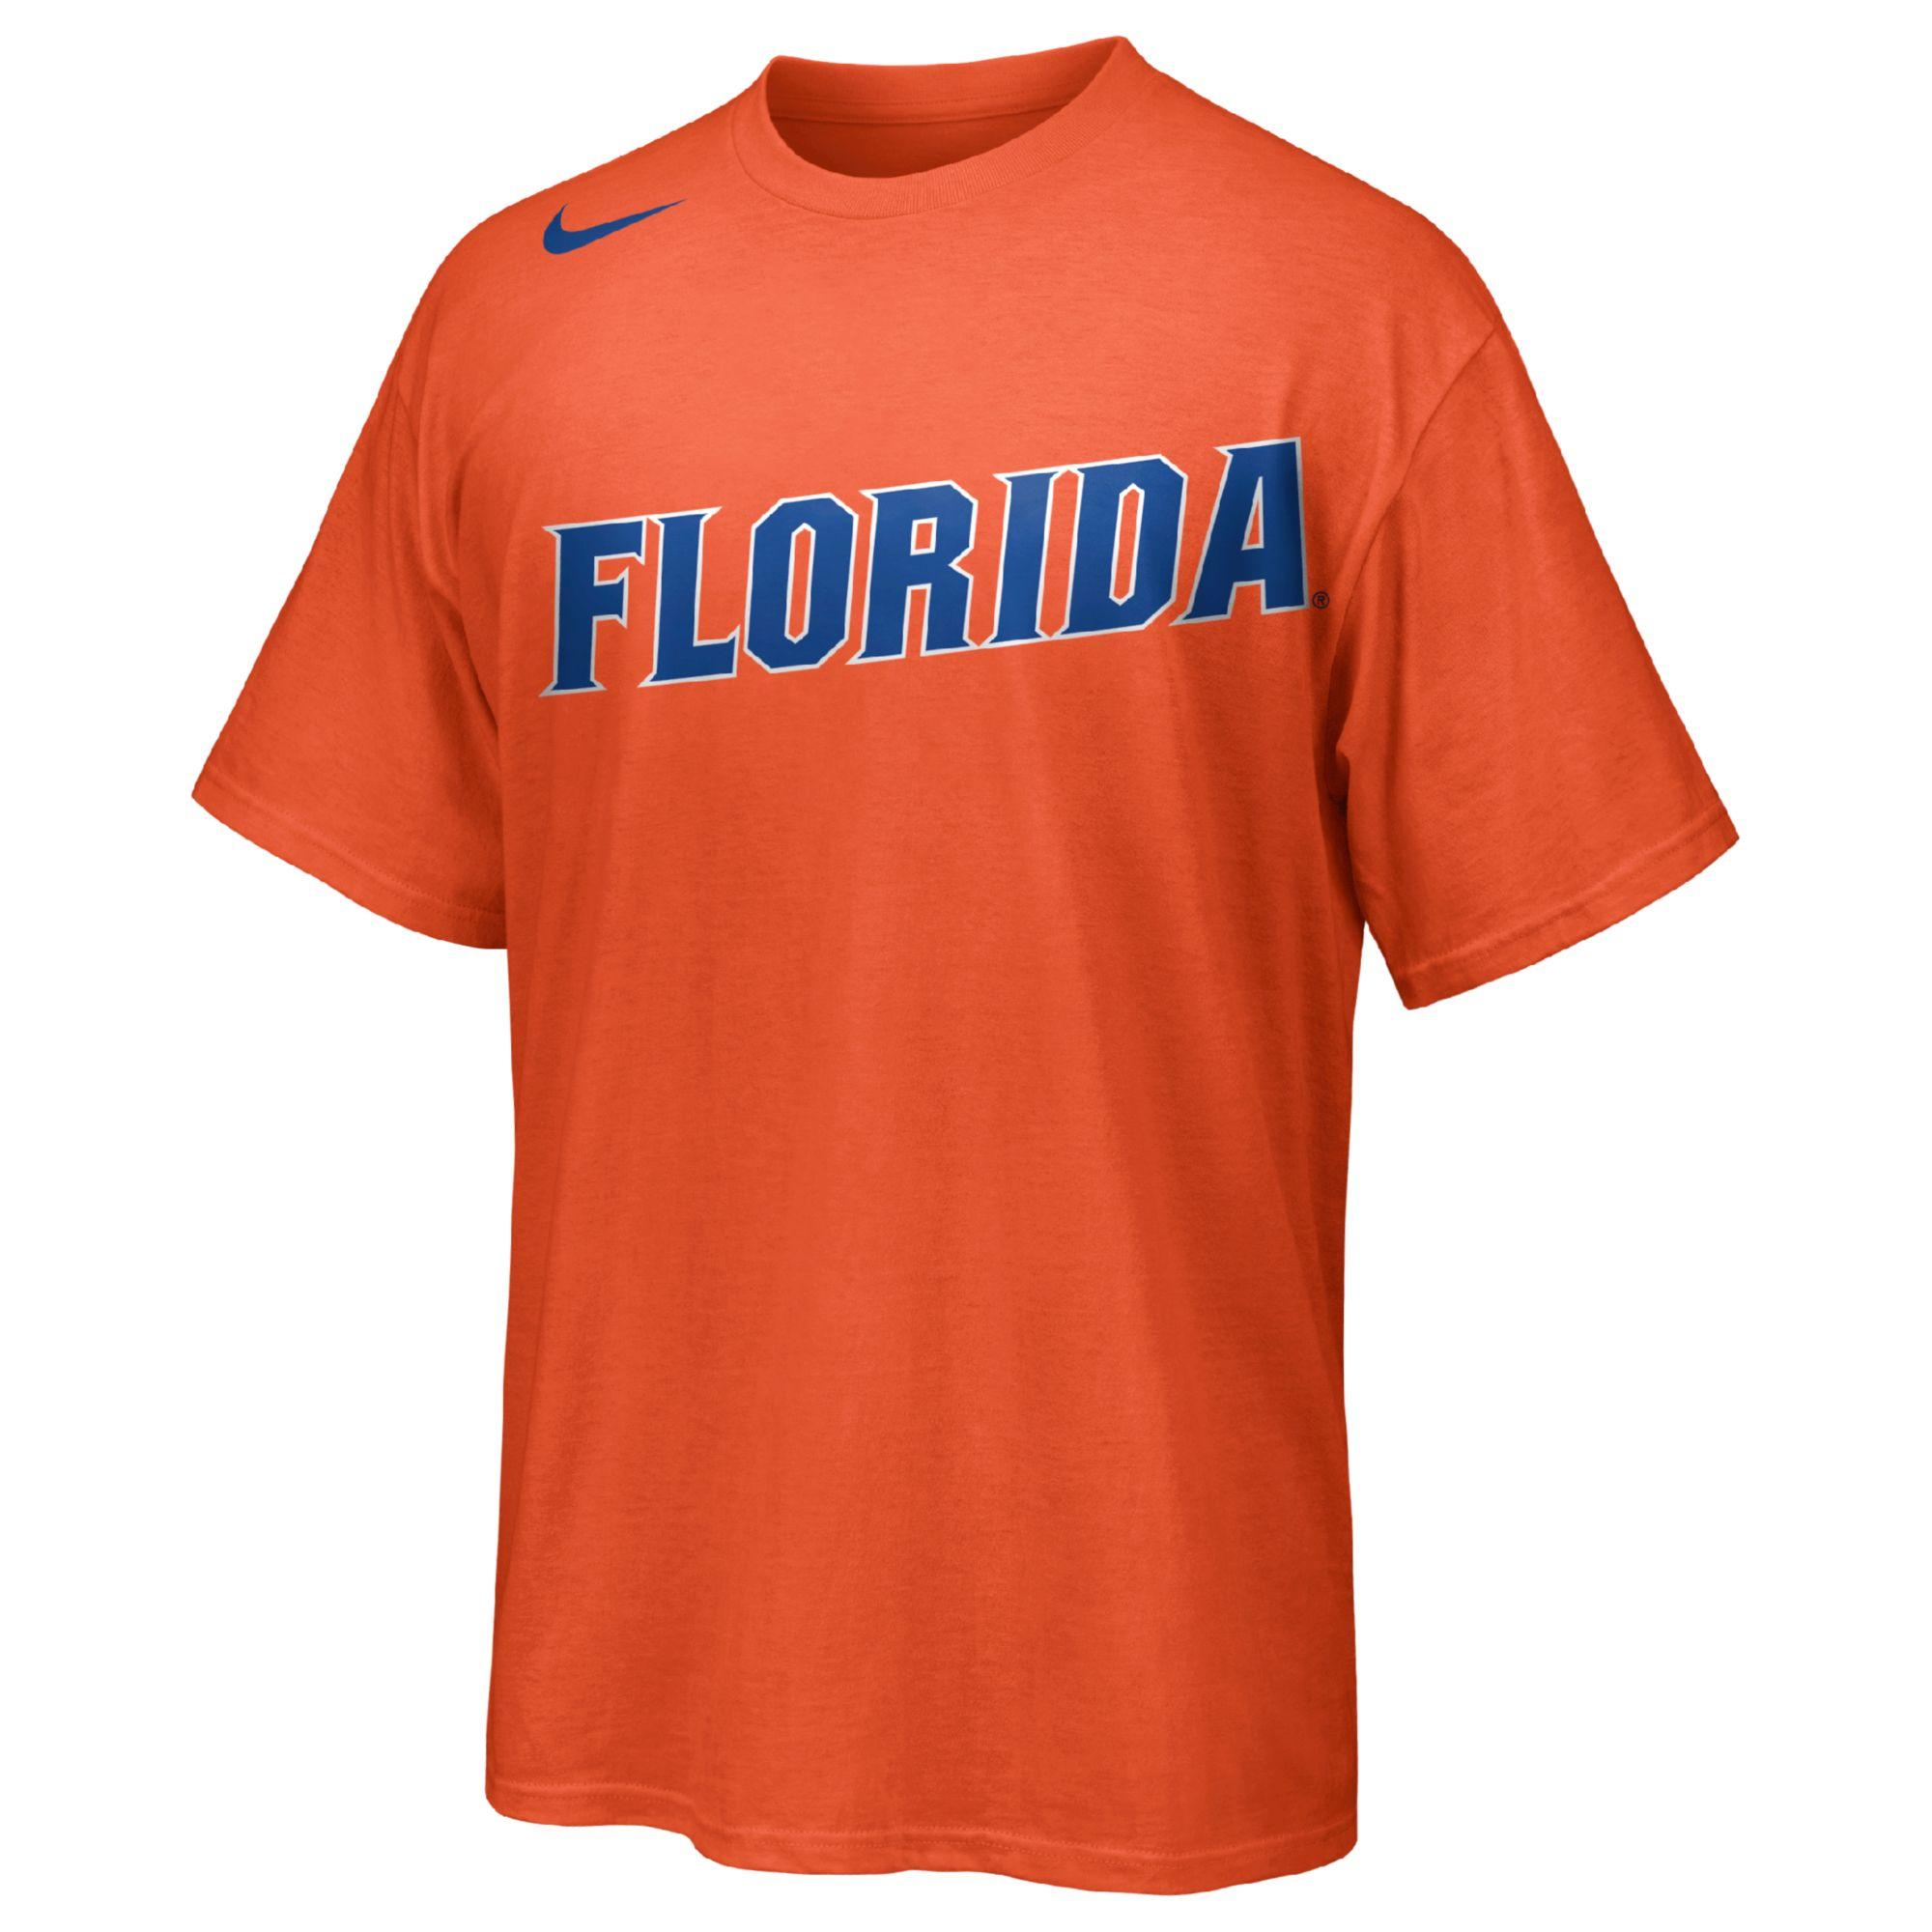 Nike Mens Shortsleeve Florida Gators Ncaa Tshirt In Orange